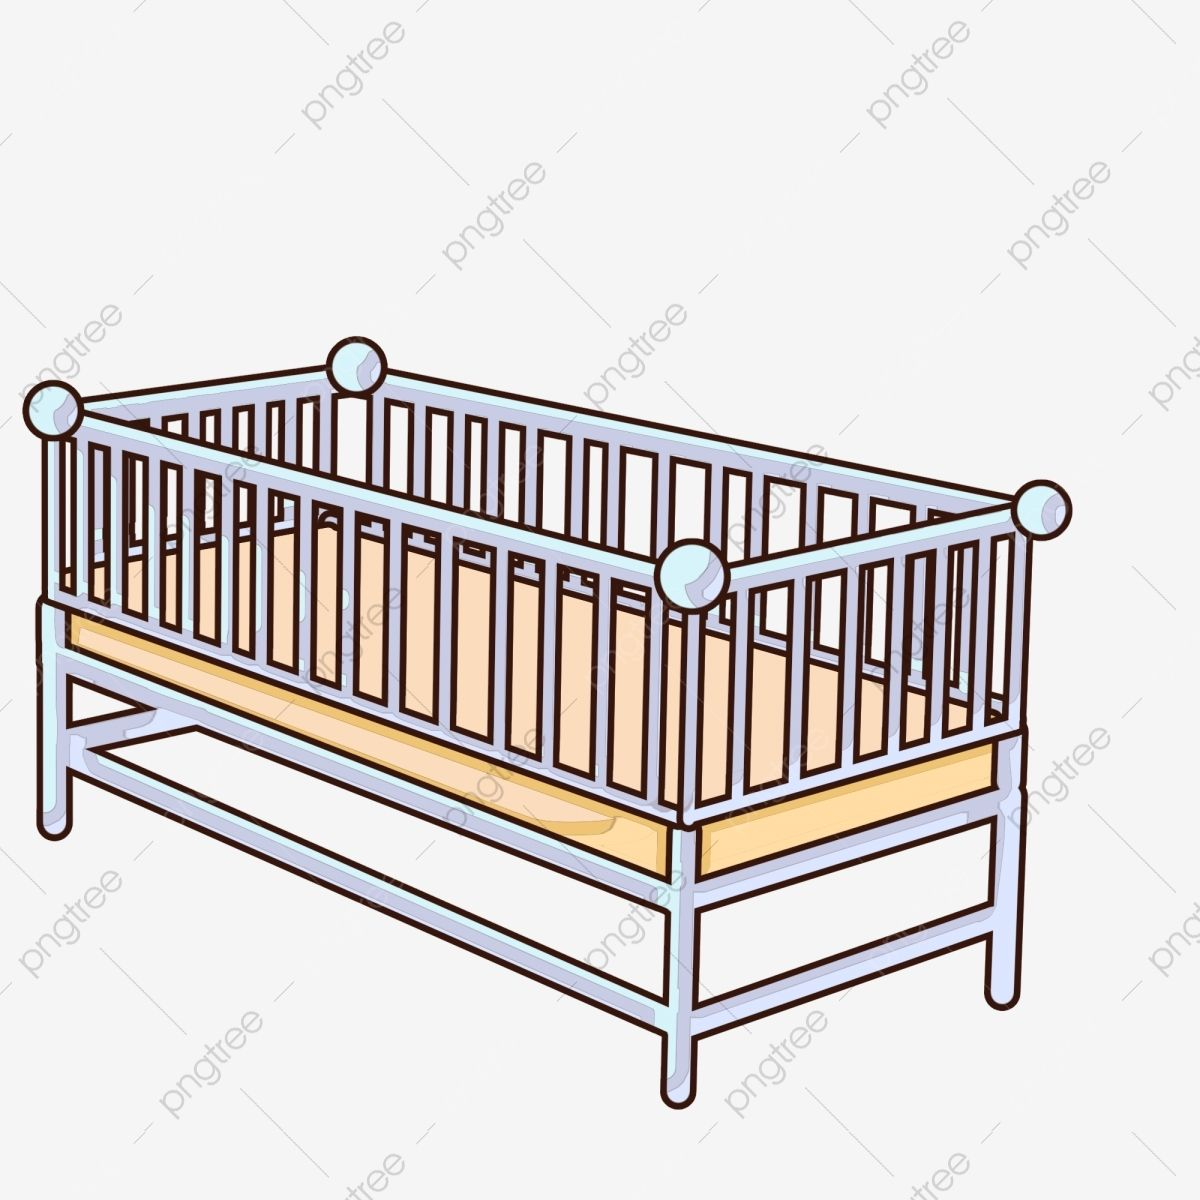 Cot Clipart Ideas In 2021 Metal Crib Mini Crib Baby Bed